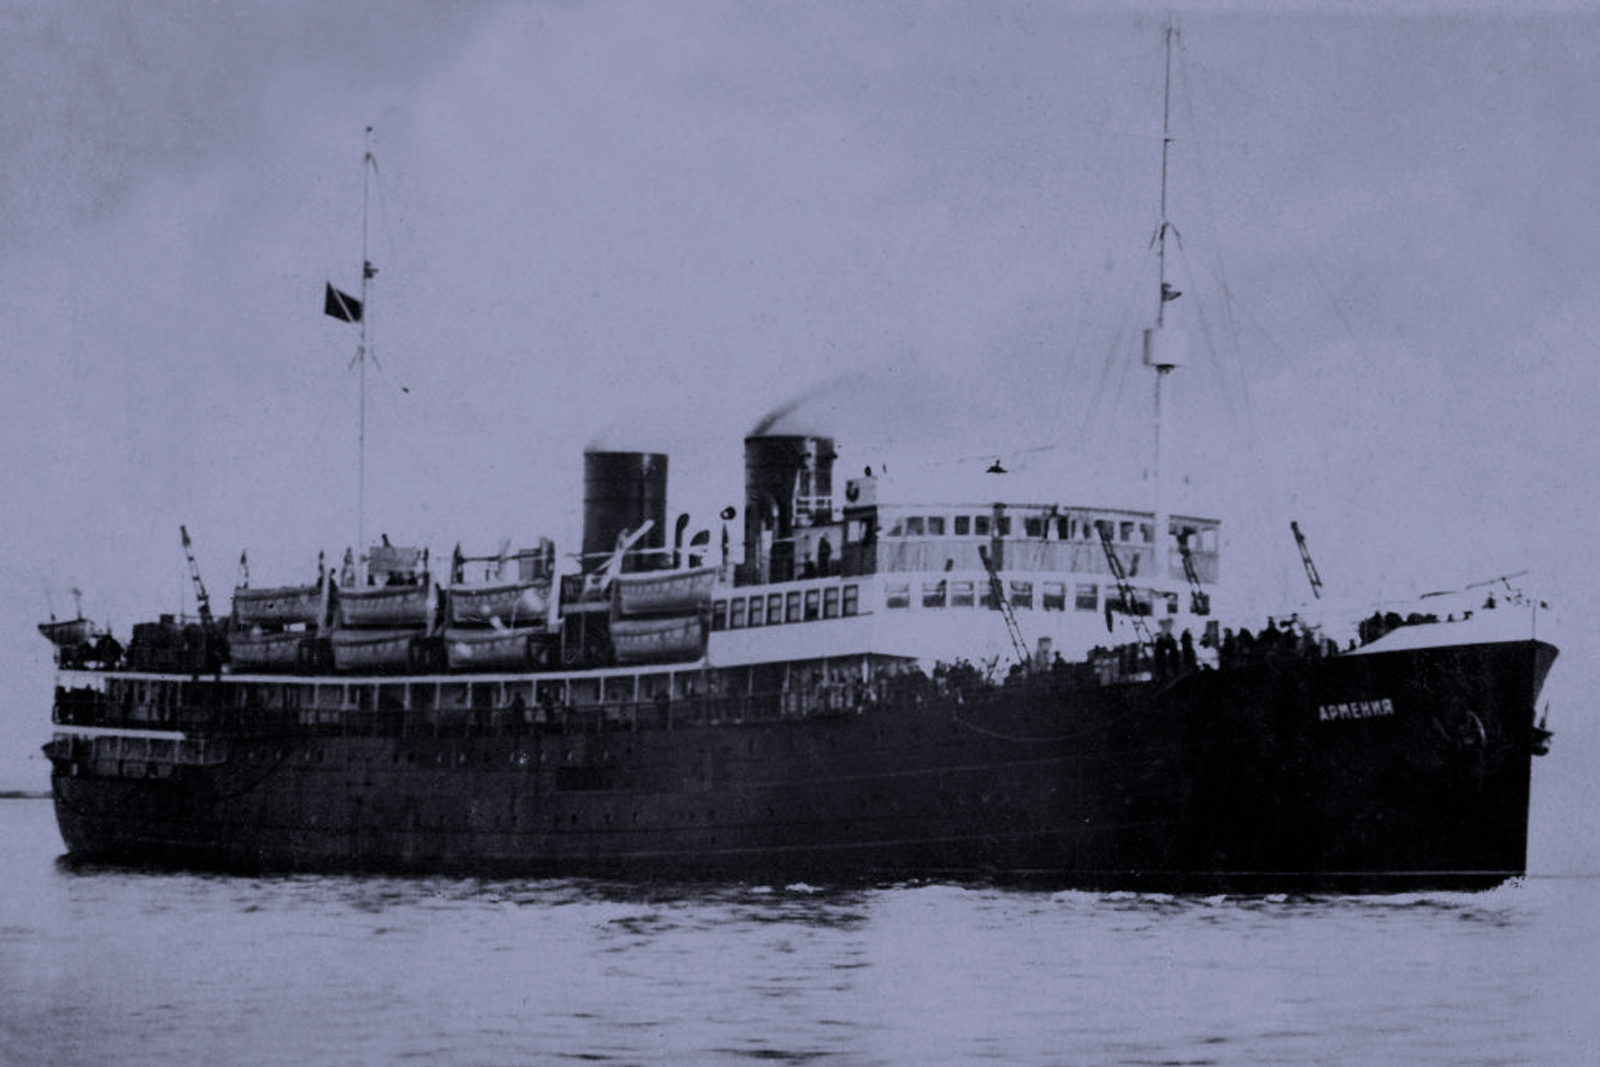 "<p>Фото © <a href=""https://en.wikipedia.org/wiki/Soviet_hospital_ship_Armenia"" target=""_blank"" rel=""noopener noreferrer"">Wikipedia</a></p>"